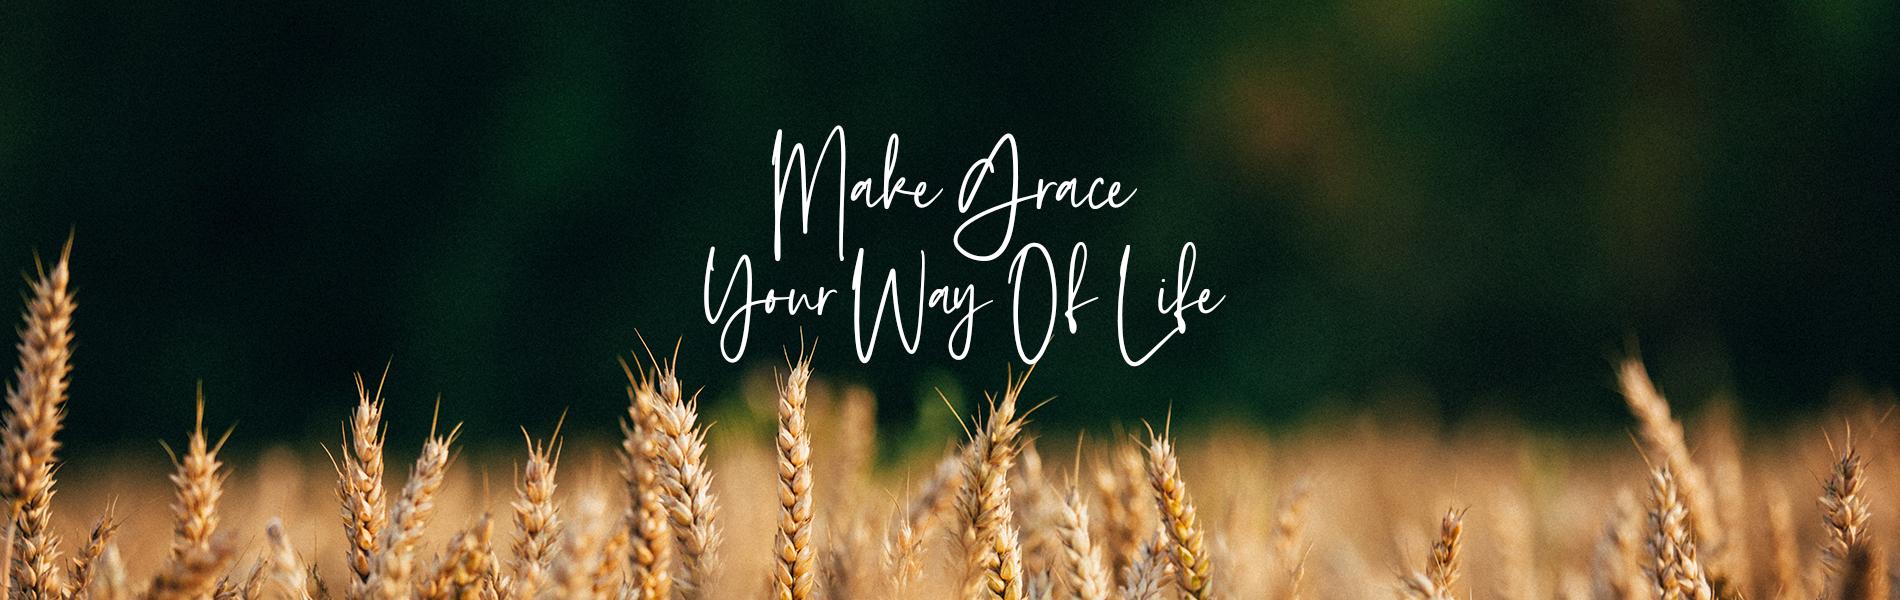 Apr_Make_Grace_Way_of_Life_EN New Creation TV | Broadcasting the Gospel of Jesus